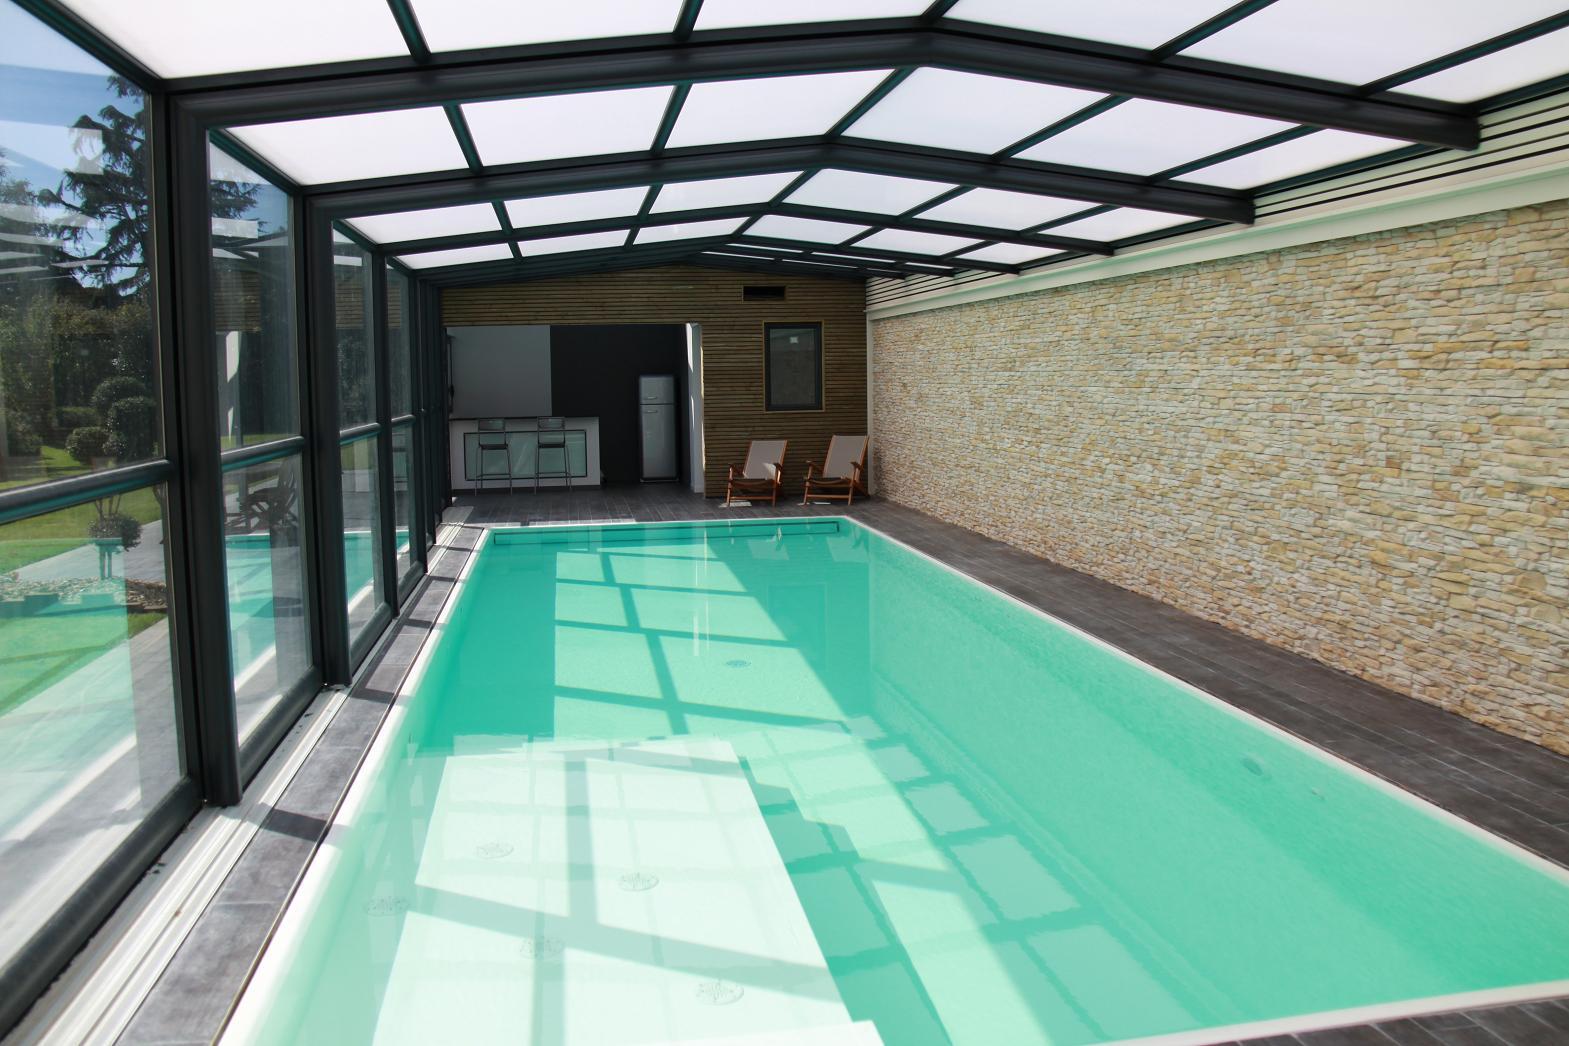 V randa t lescopique piscine fond mobile pour piscine for Veranda pour piscine